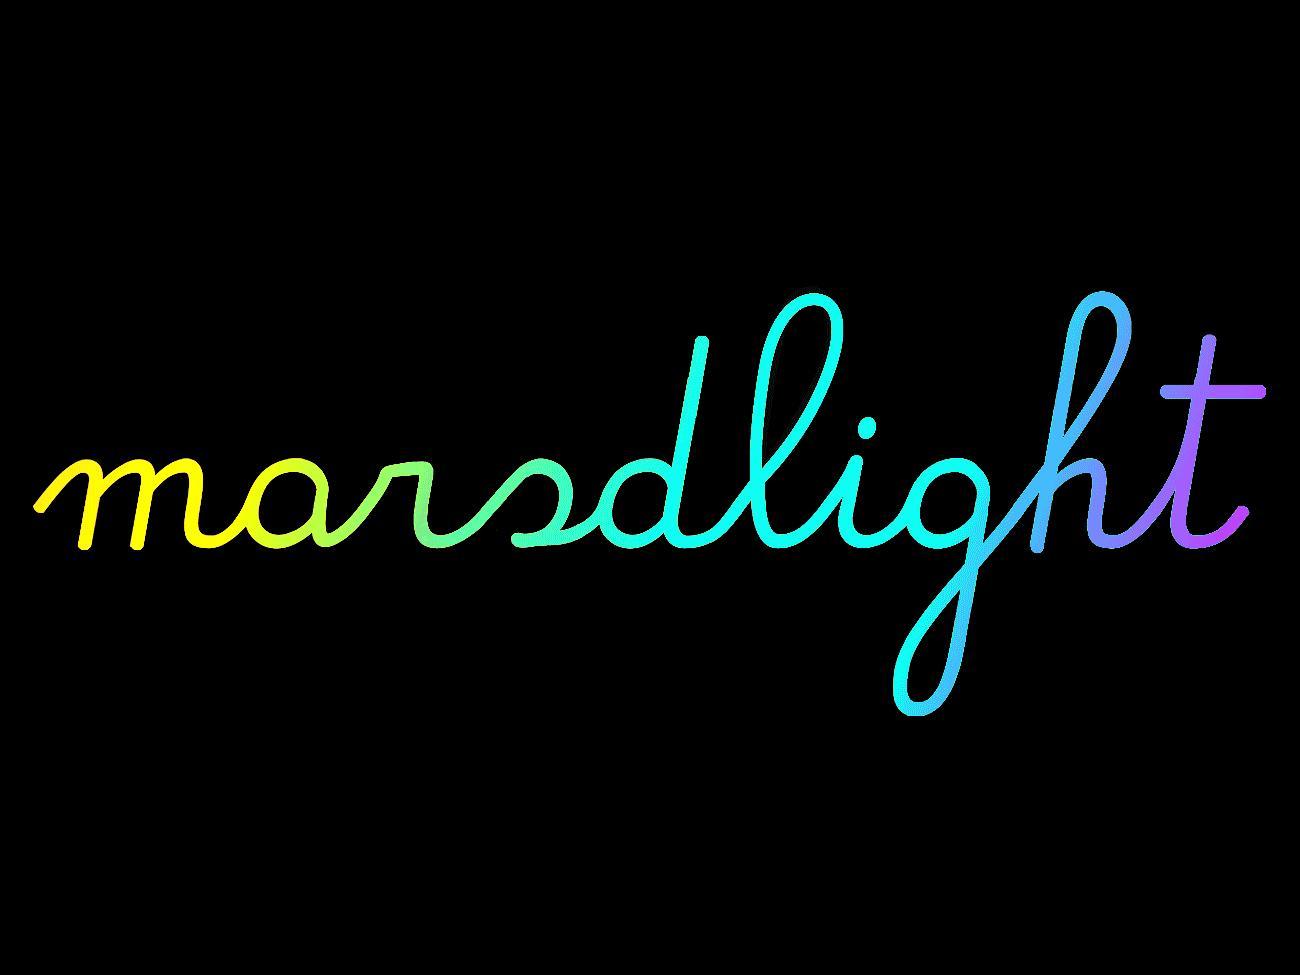 marsdesign x marsdlight